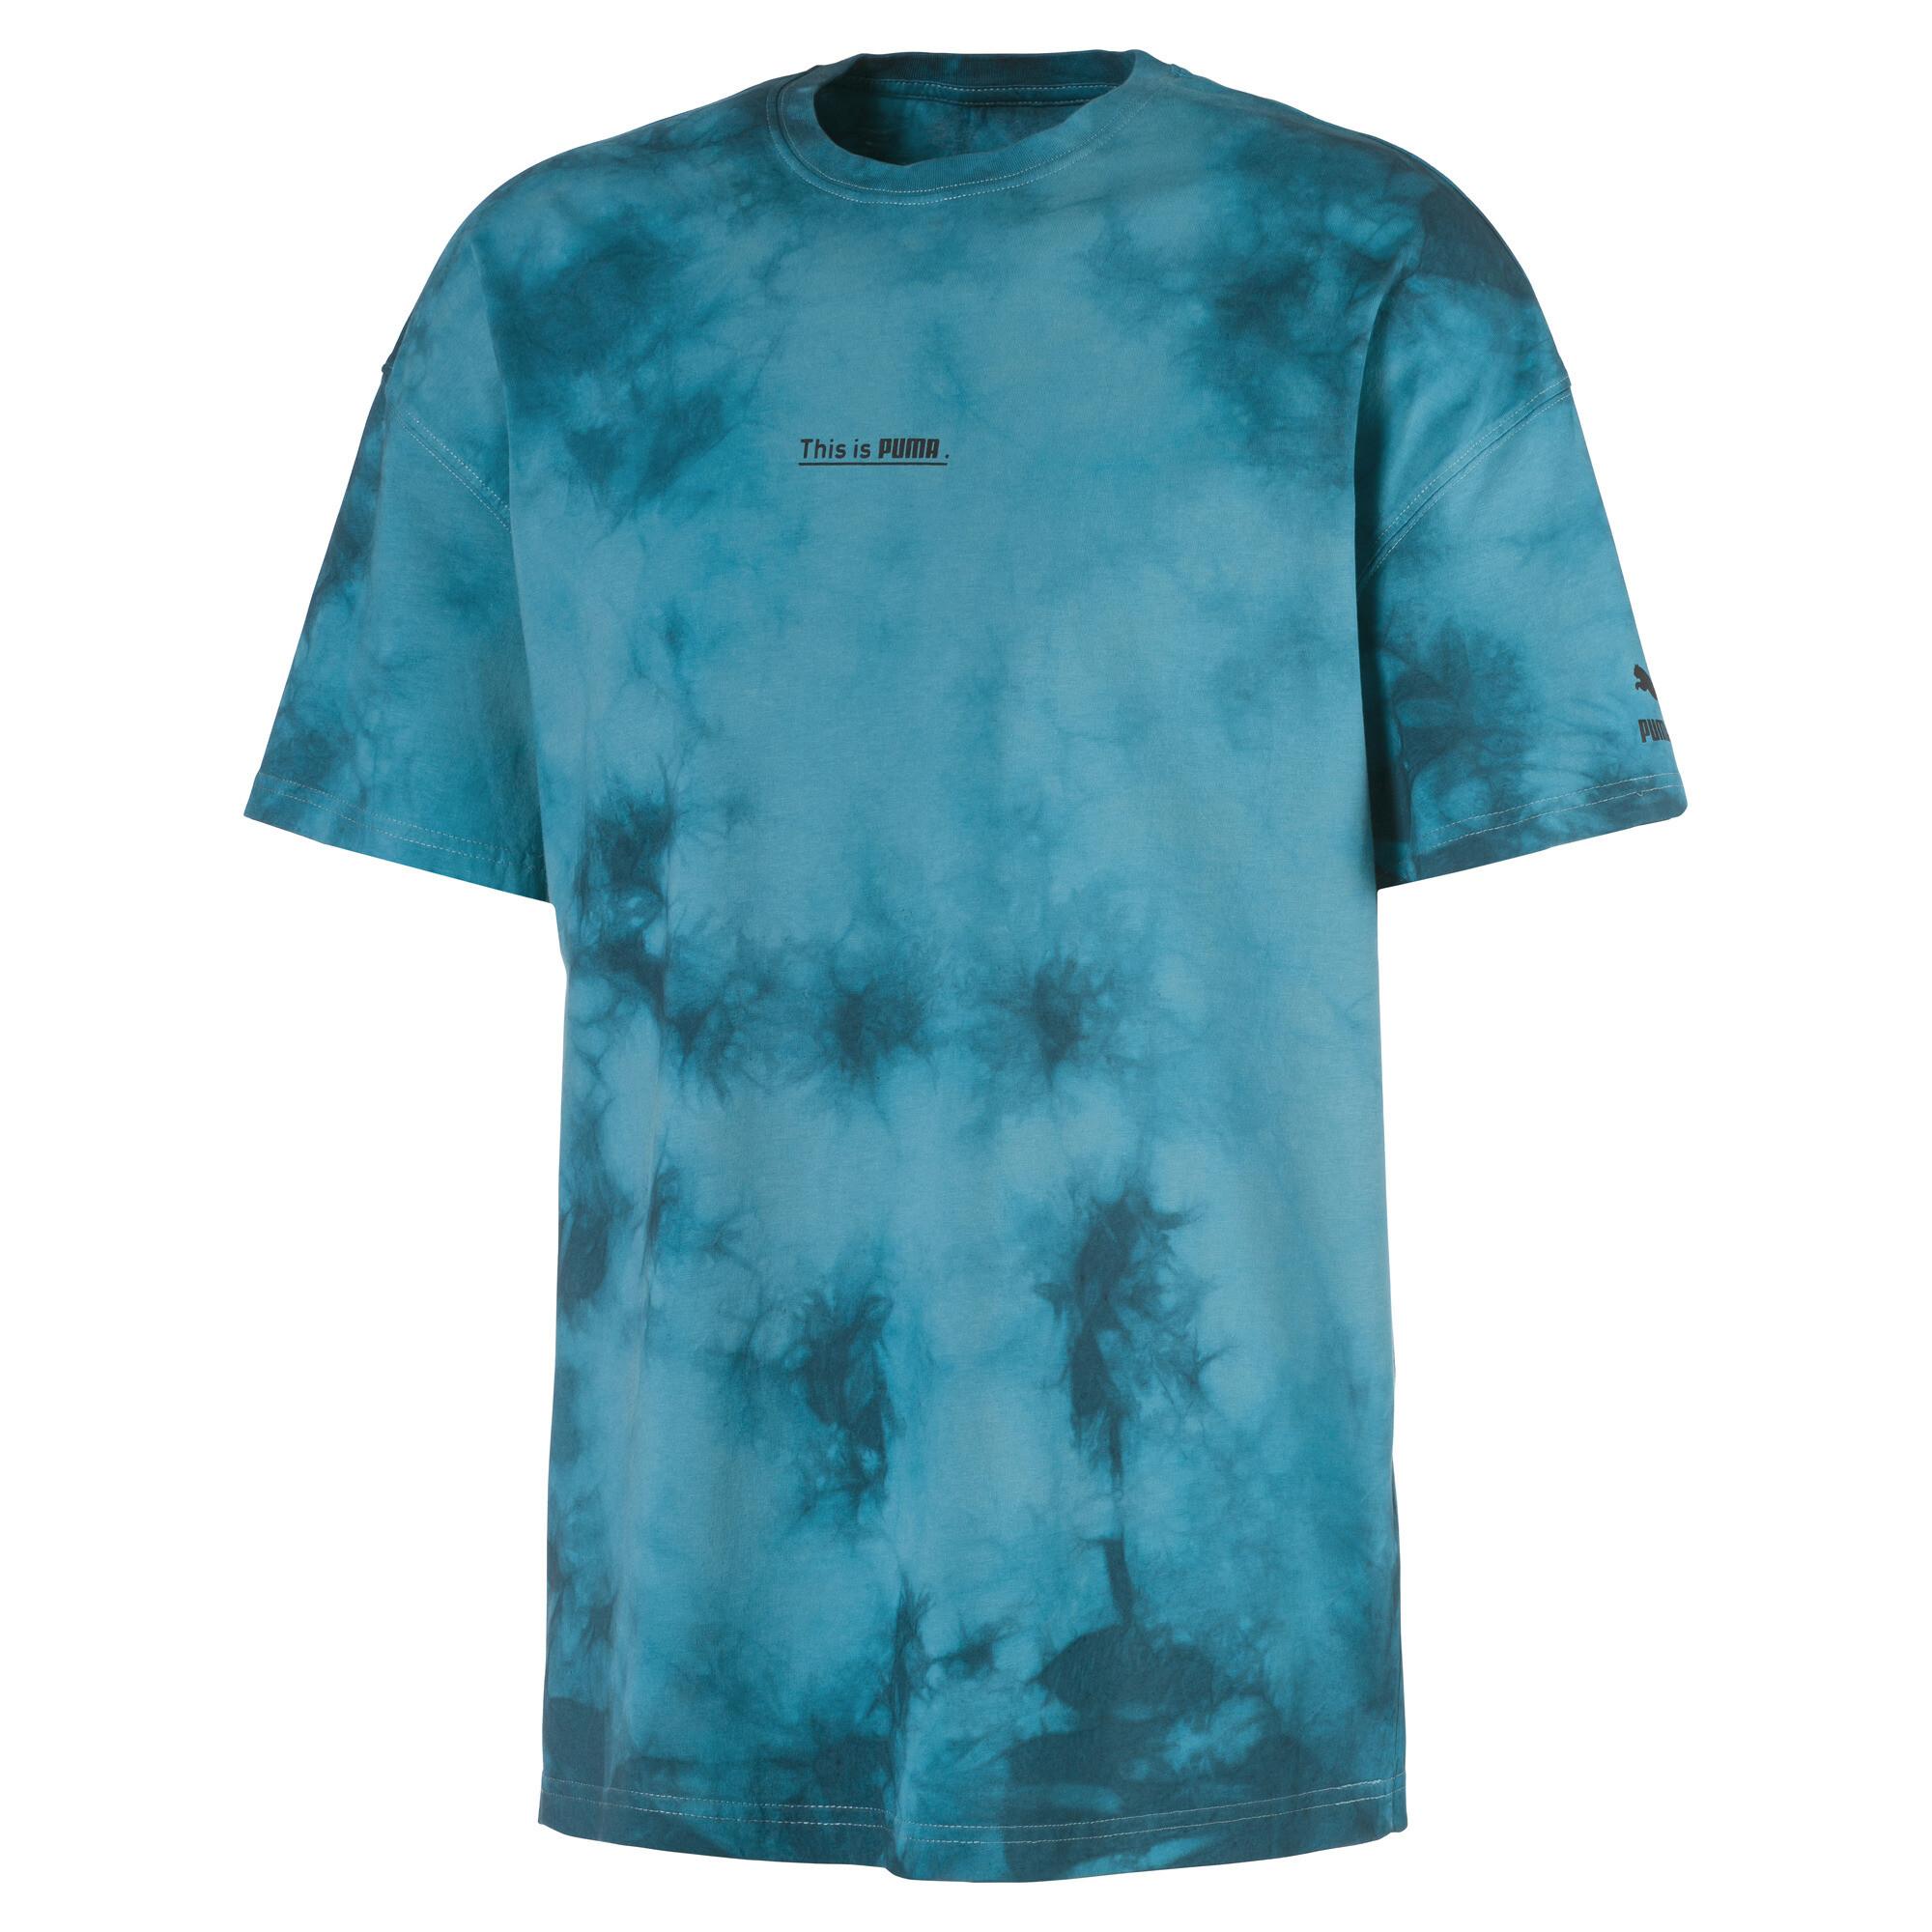 PUMA-Boxy-Herren-T-Shirt-Maenner-T-Shirt-Neu Indexbild 4